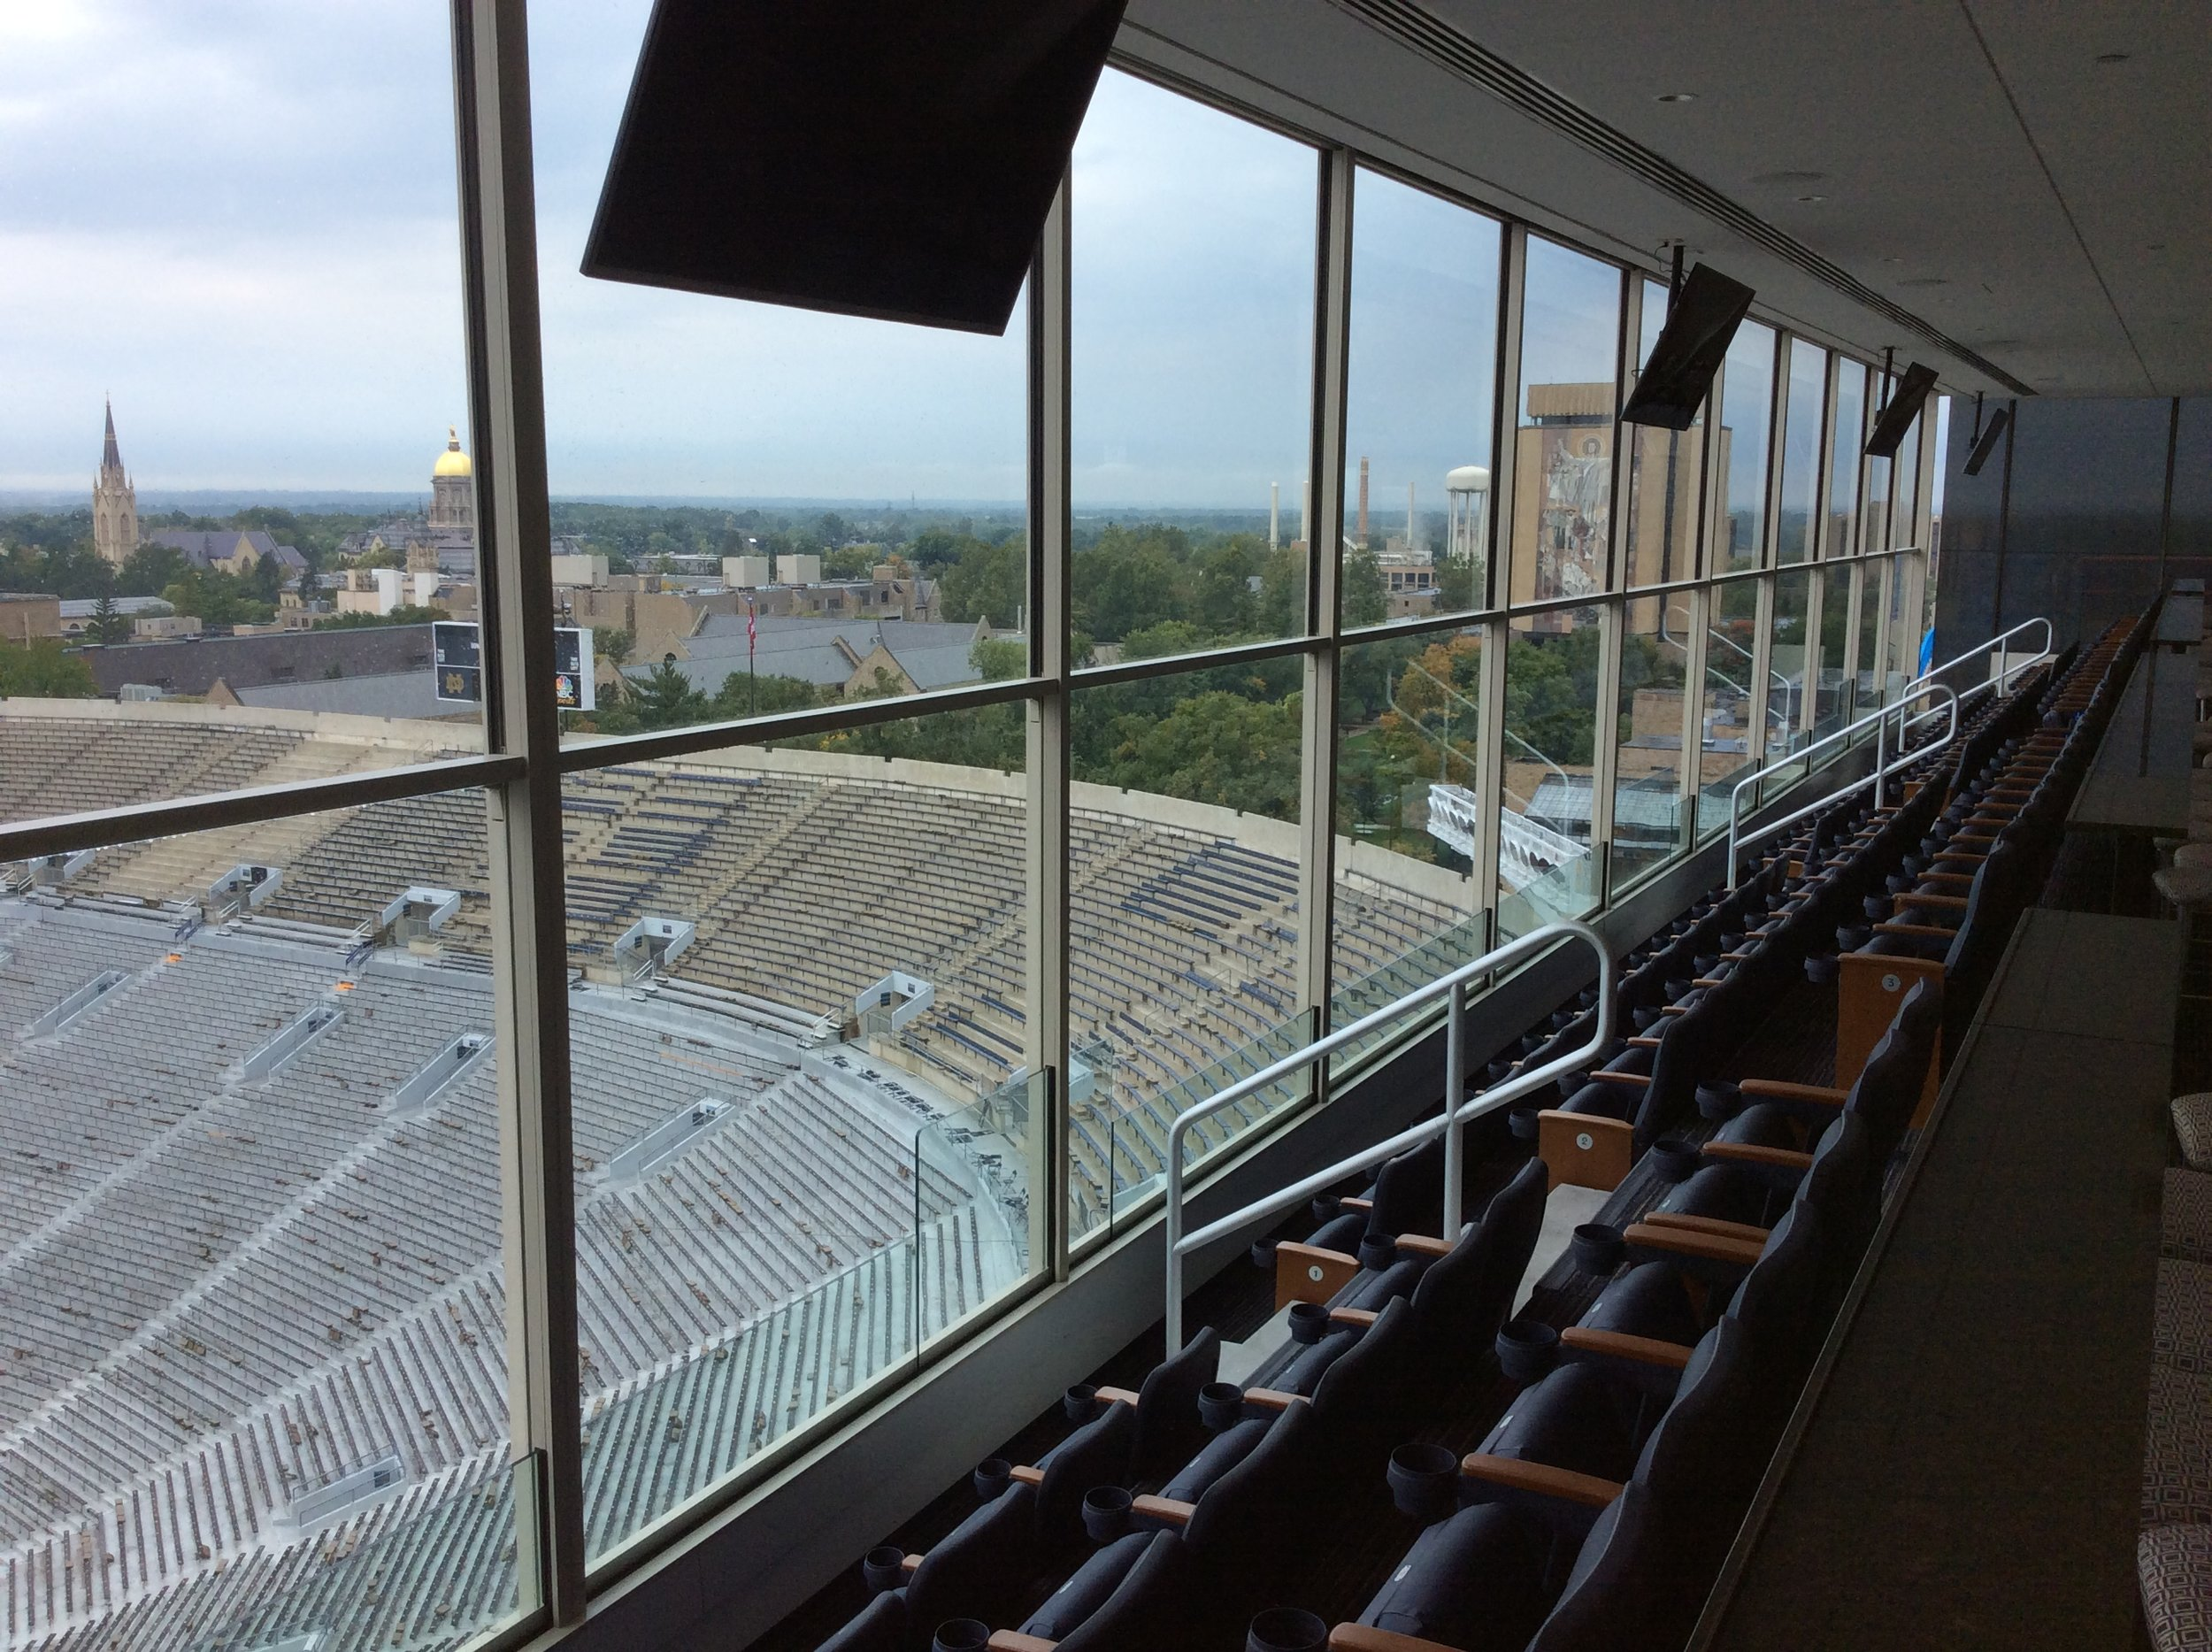 Notre Dame Stadium South Bend, Ia 3.JPG